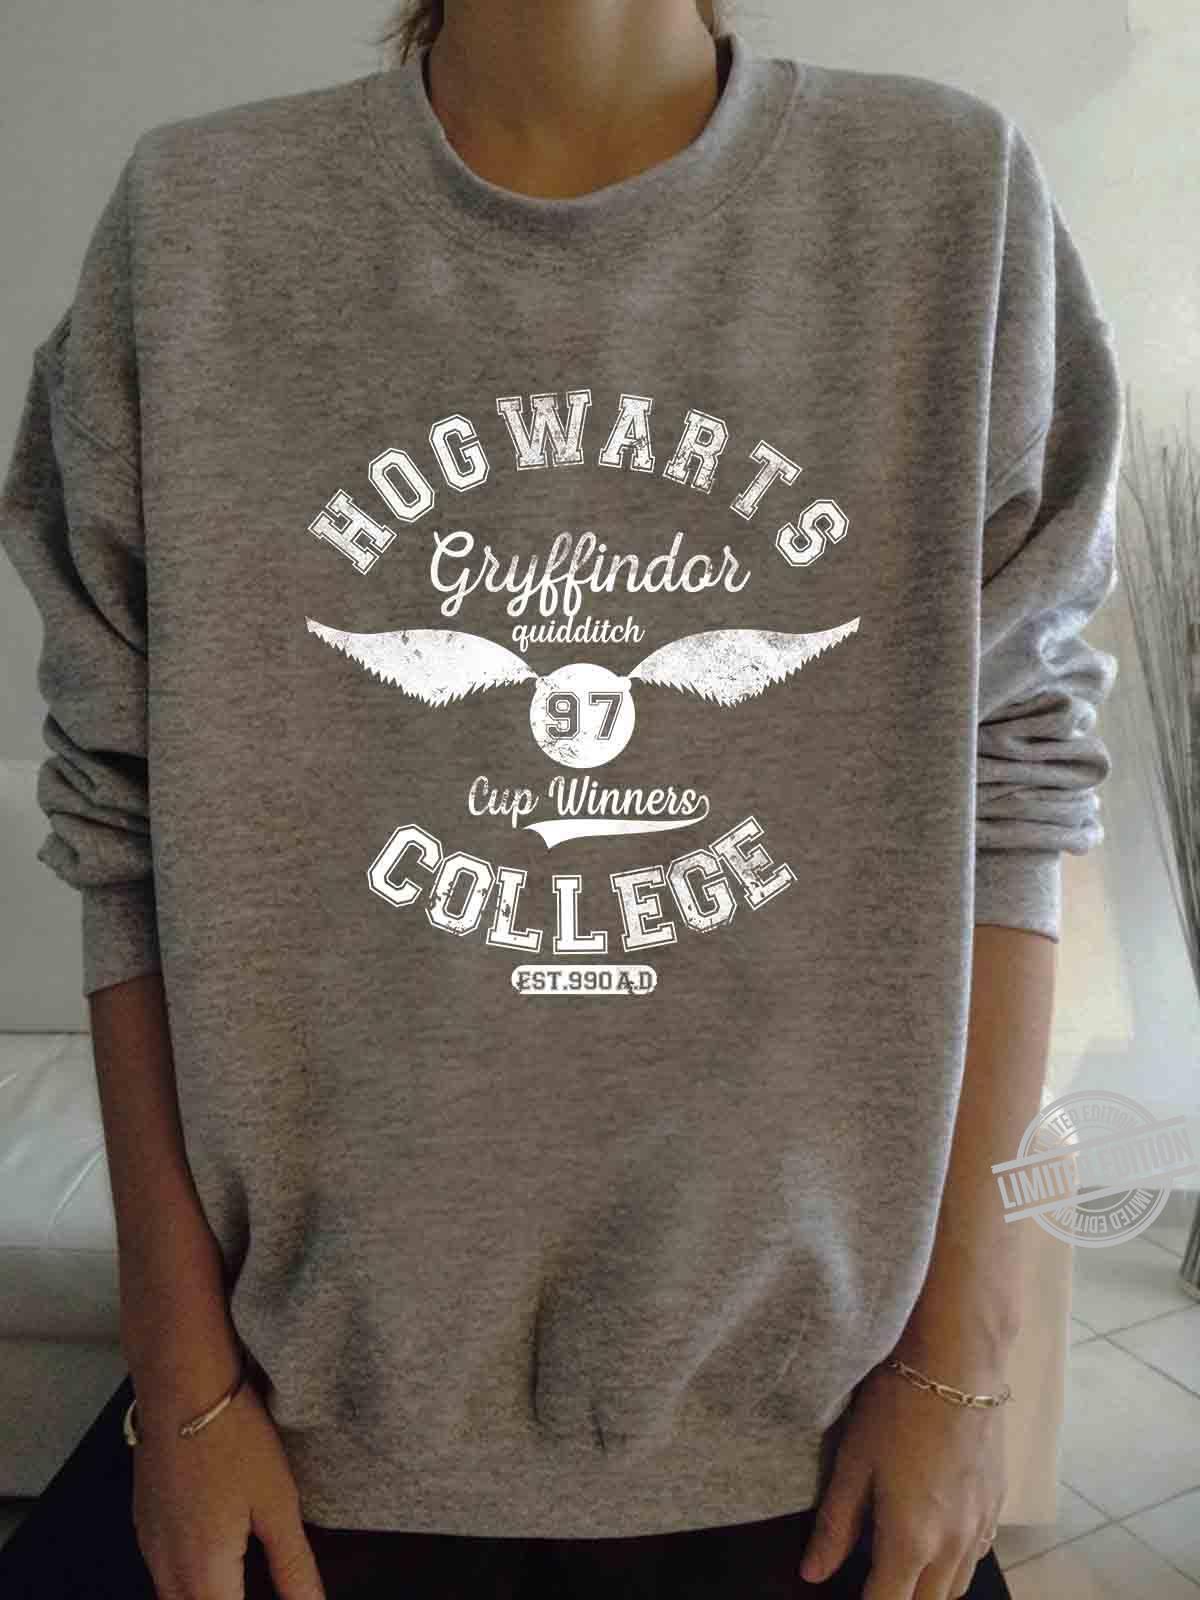 Hogwarts Gryffindor Quidditch 97 Cup Winners College Est 990 A.D Shirt